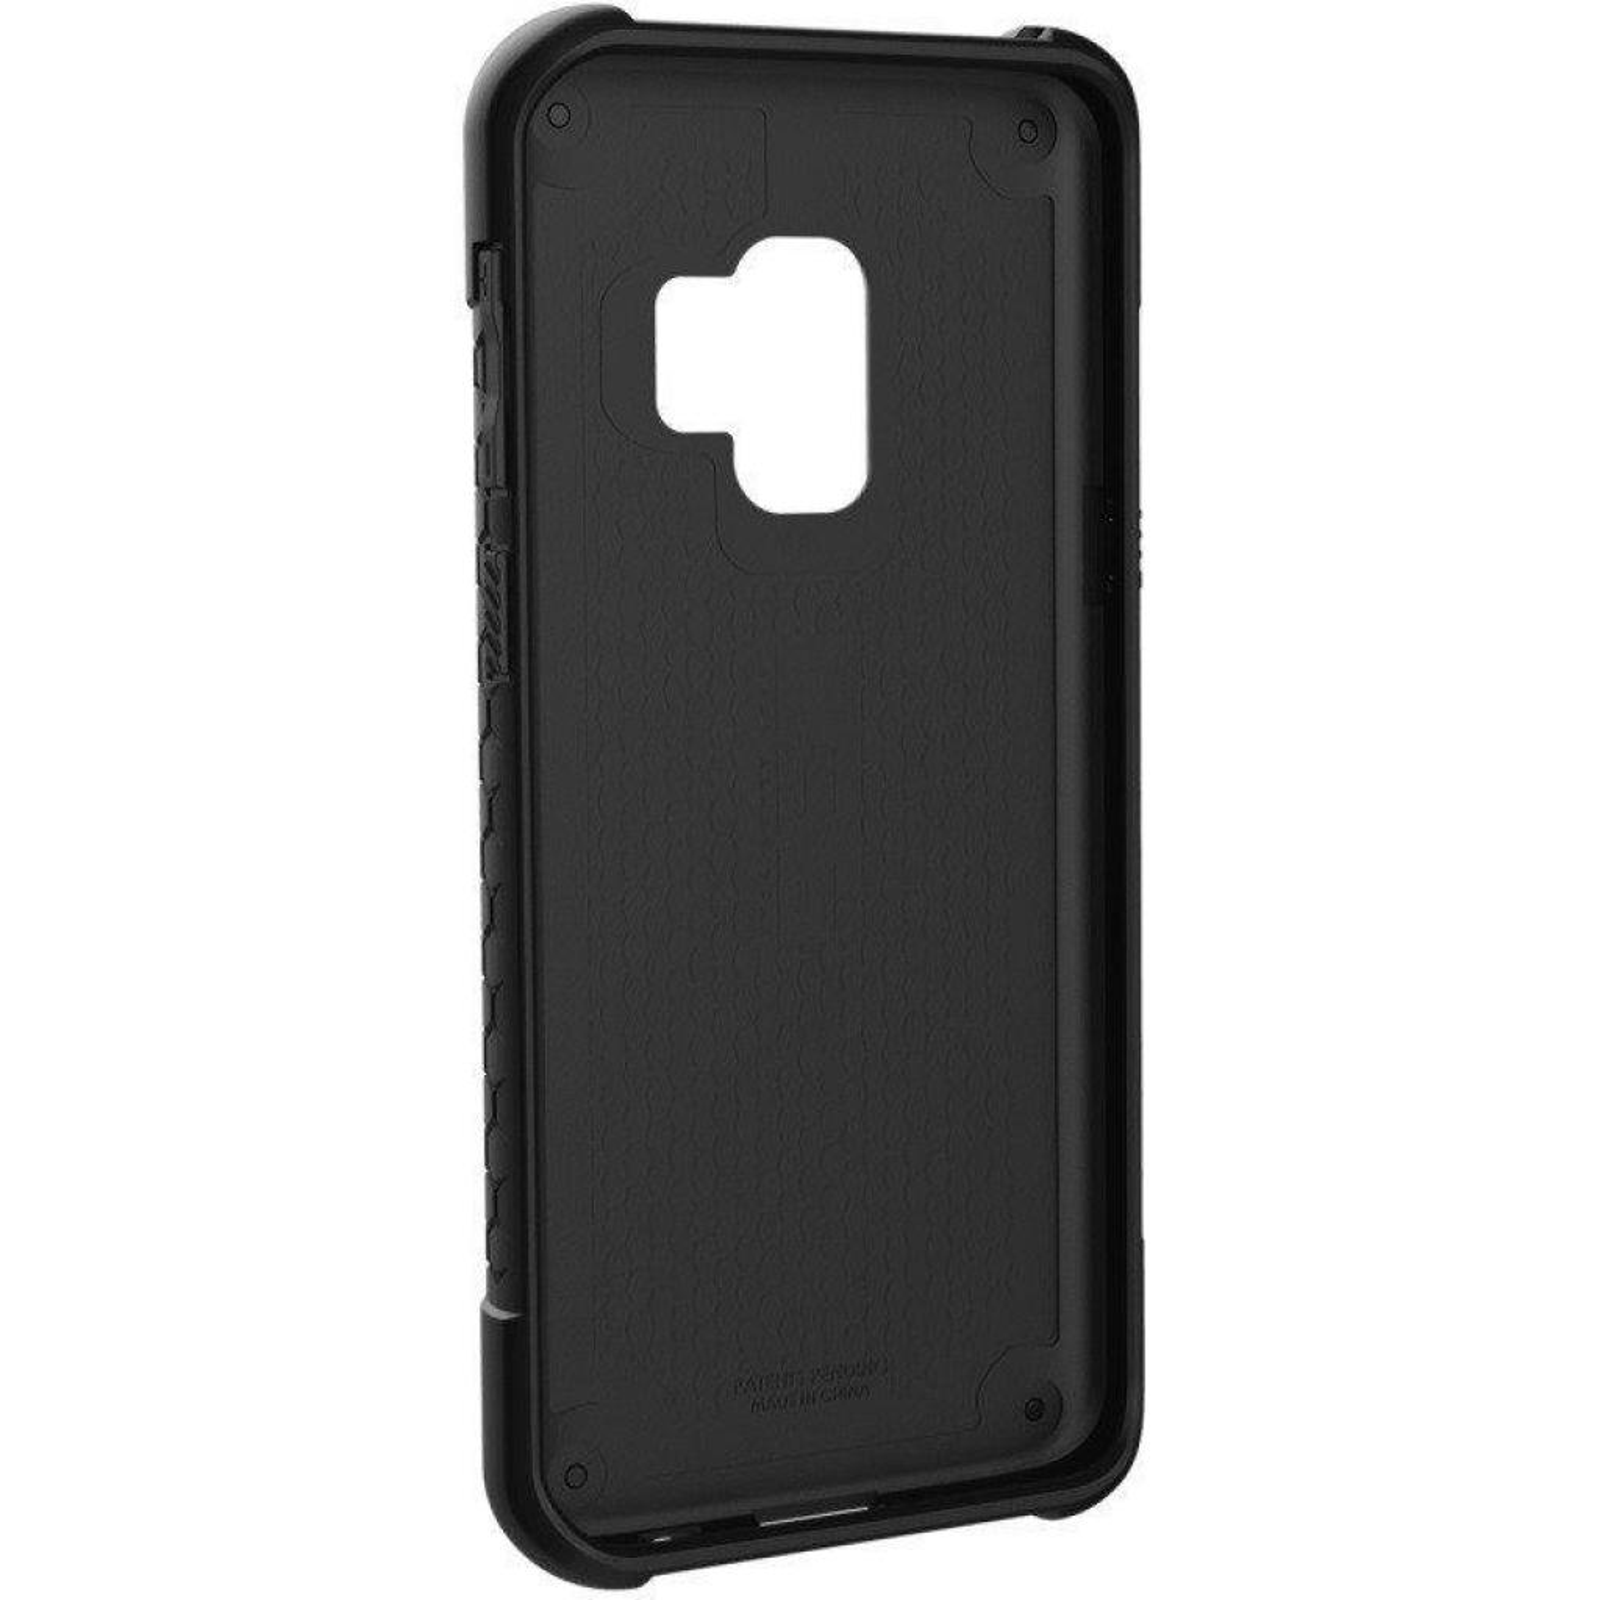 Чехол для моб. телефона Urban Armor Gear Galaxy S9 Monarch Crimson (GLXS9-M-CR) изображение 2